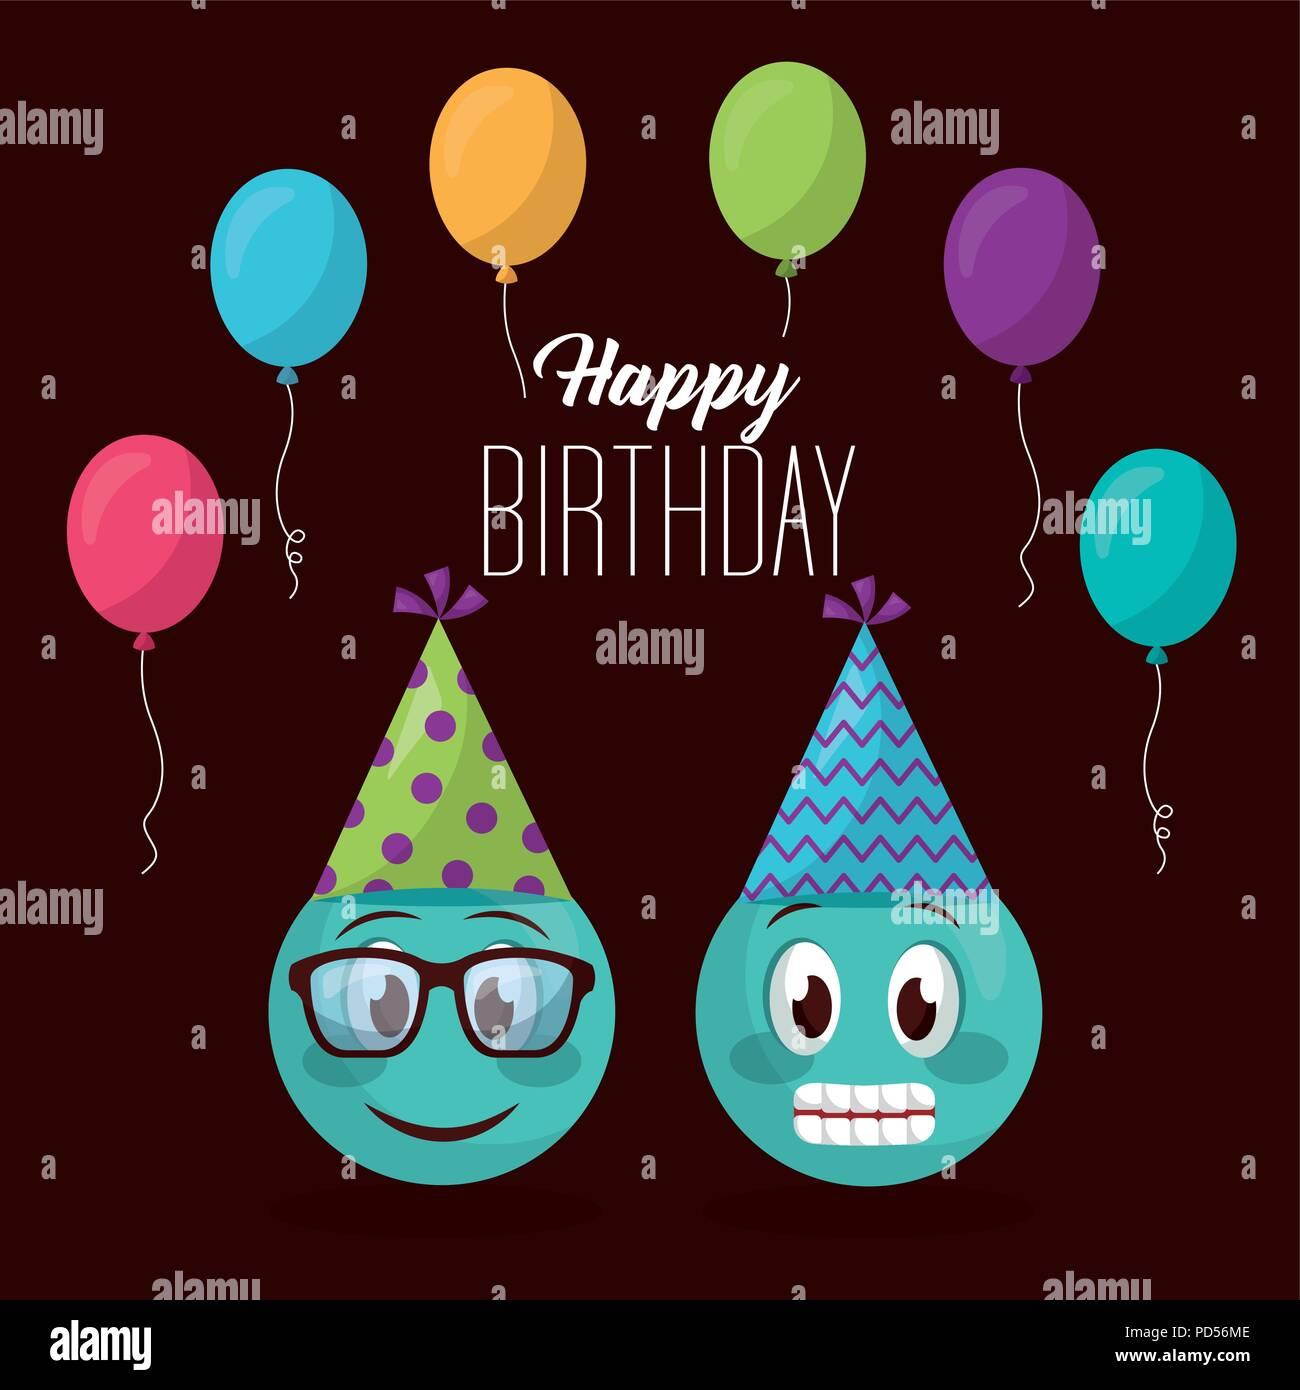 Happy Birthday Card Stock Vector Art Illustration Image